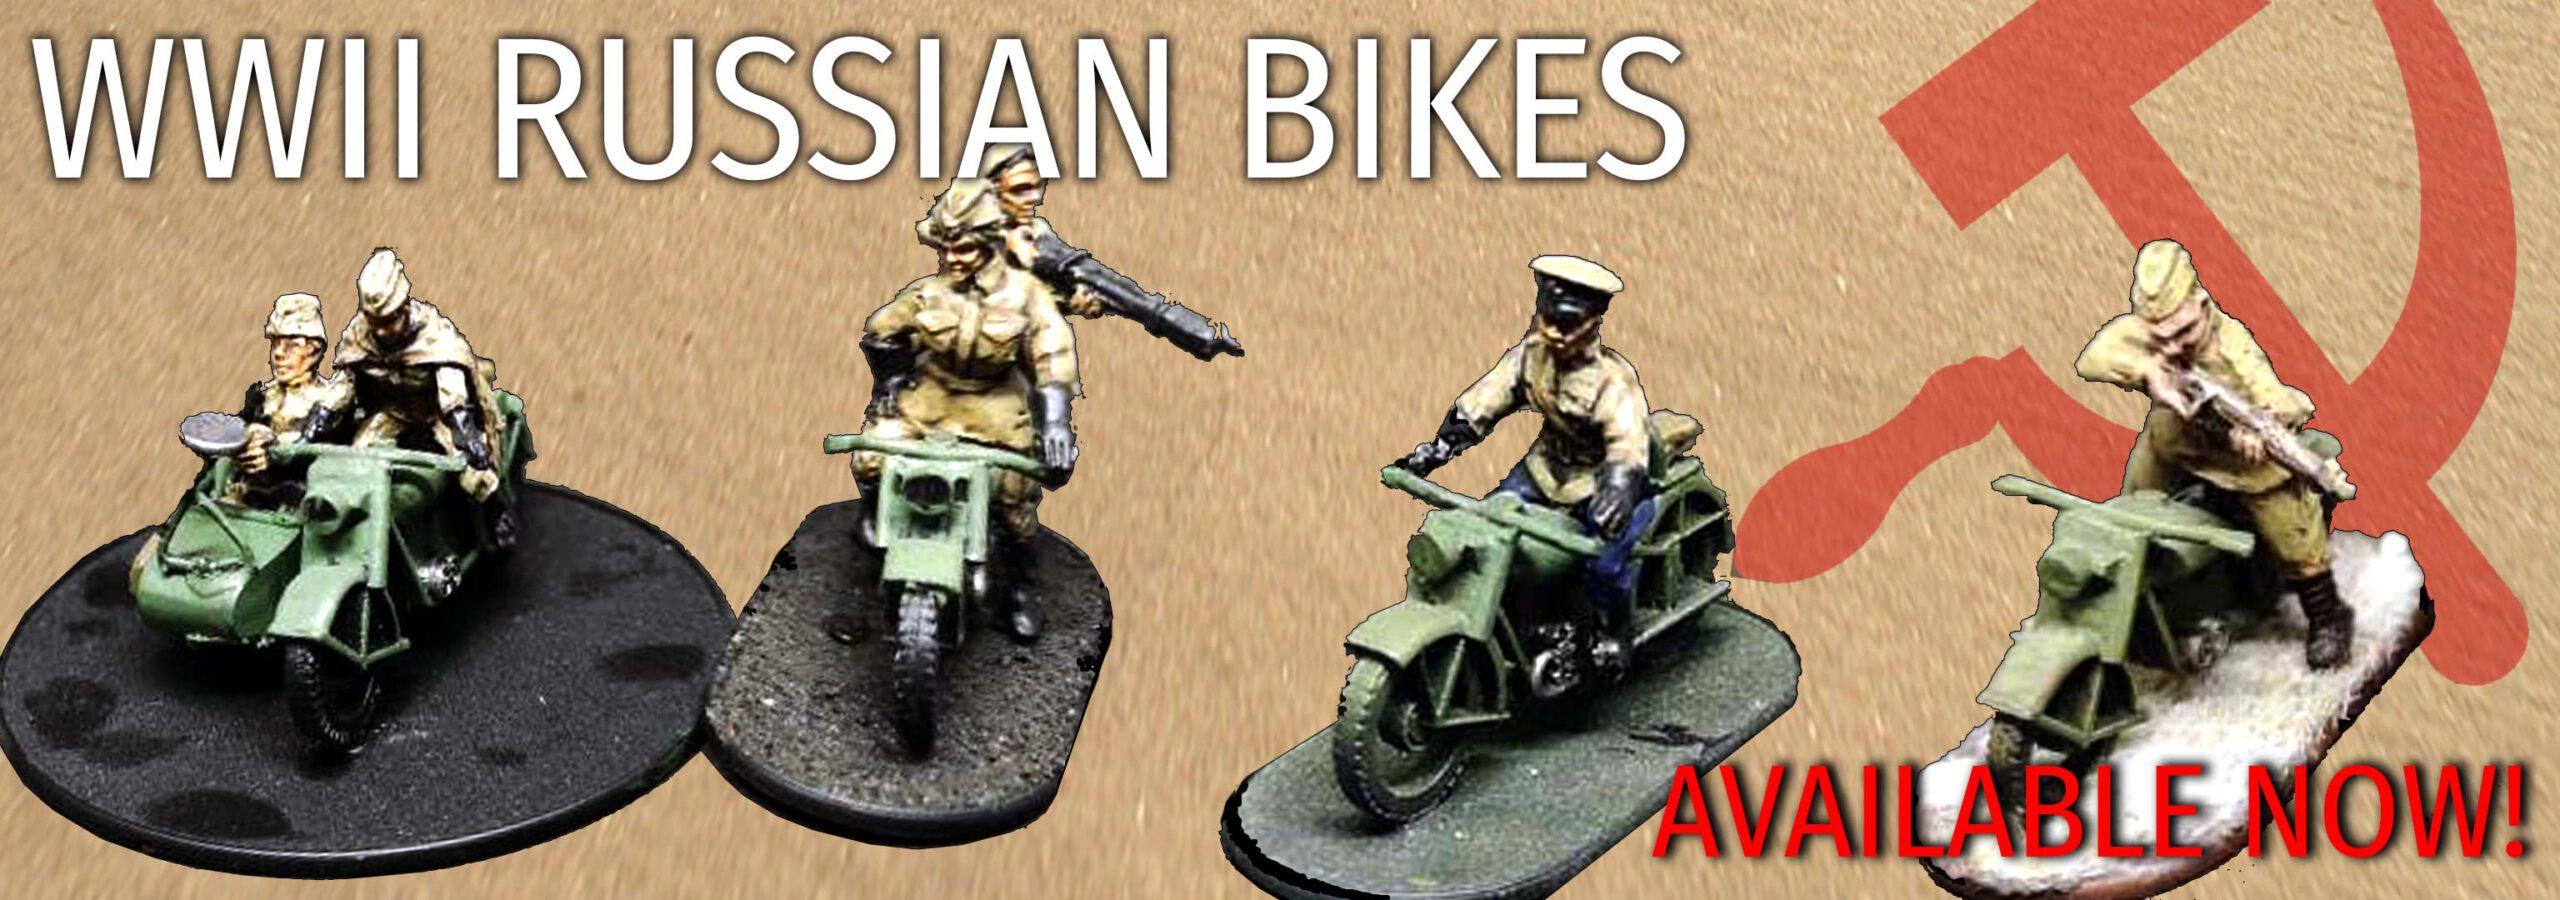 WWII Russian Bikes